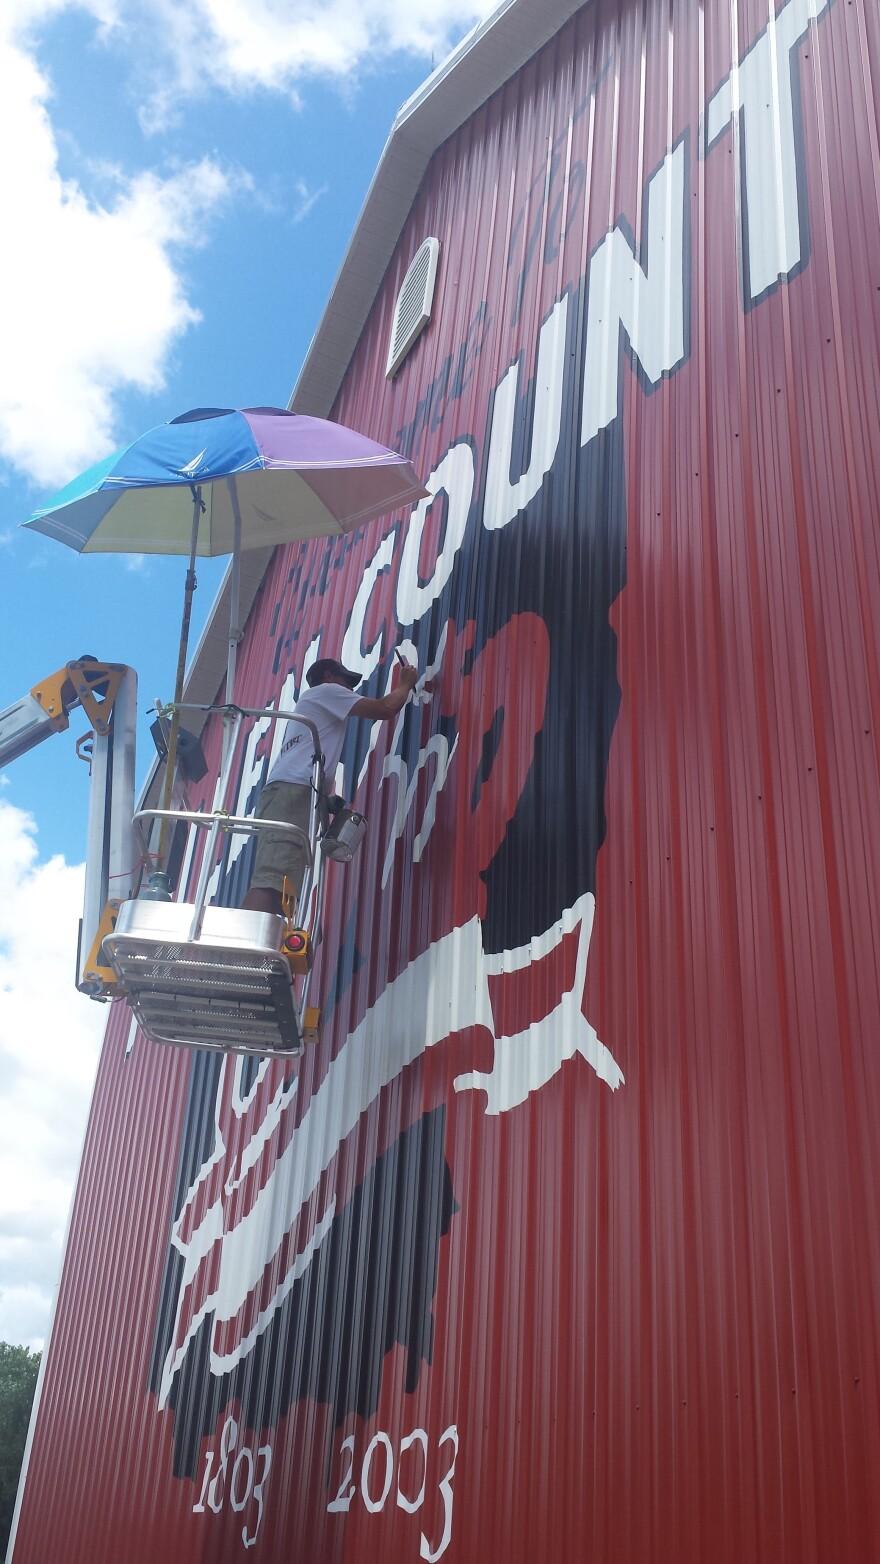 Scott Hagan has painted over 600 barns.